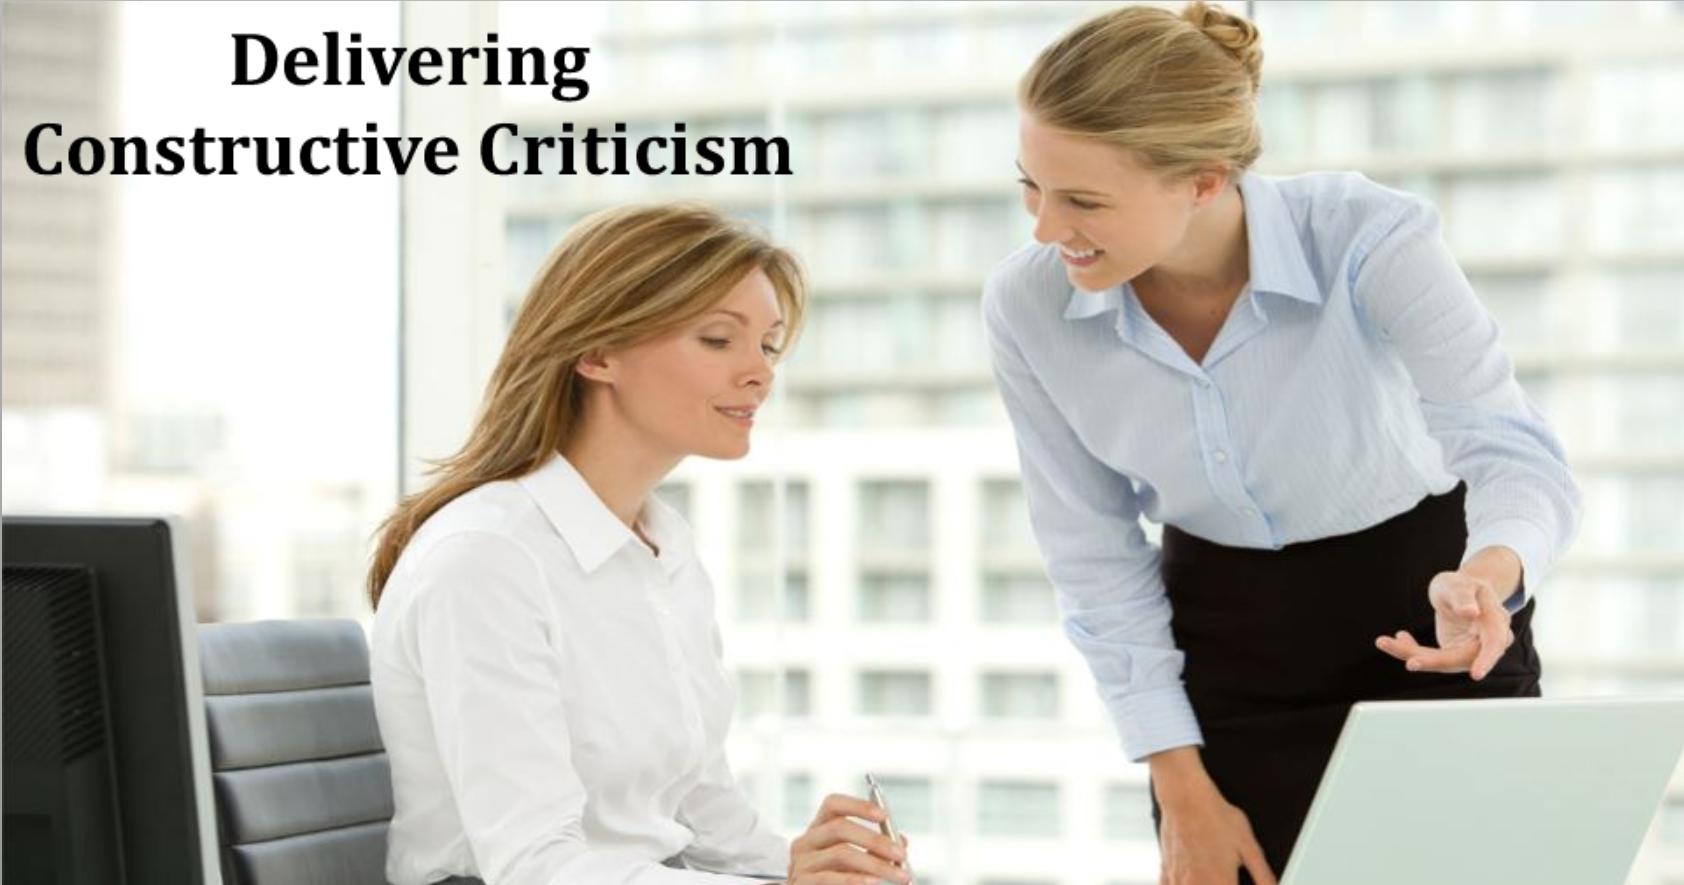 Delivering Constructive Criticism